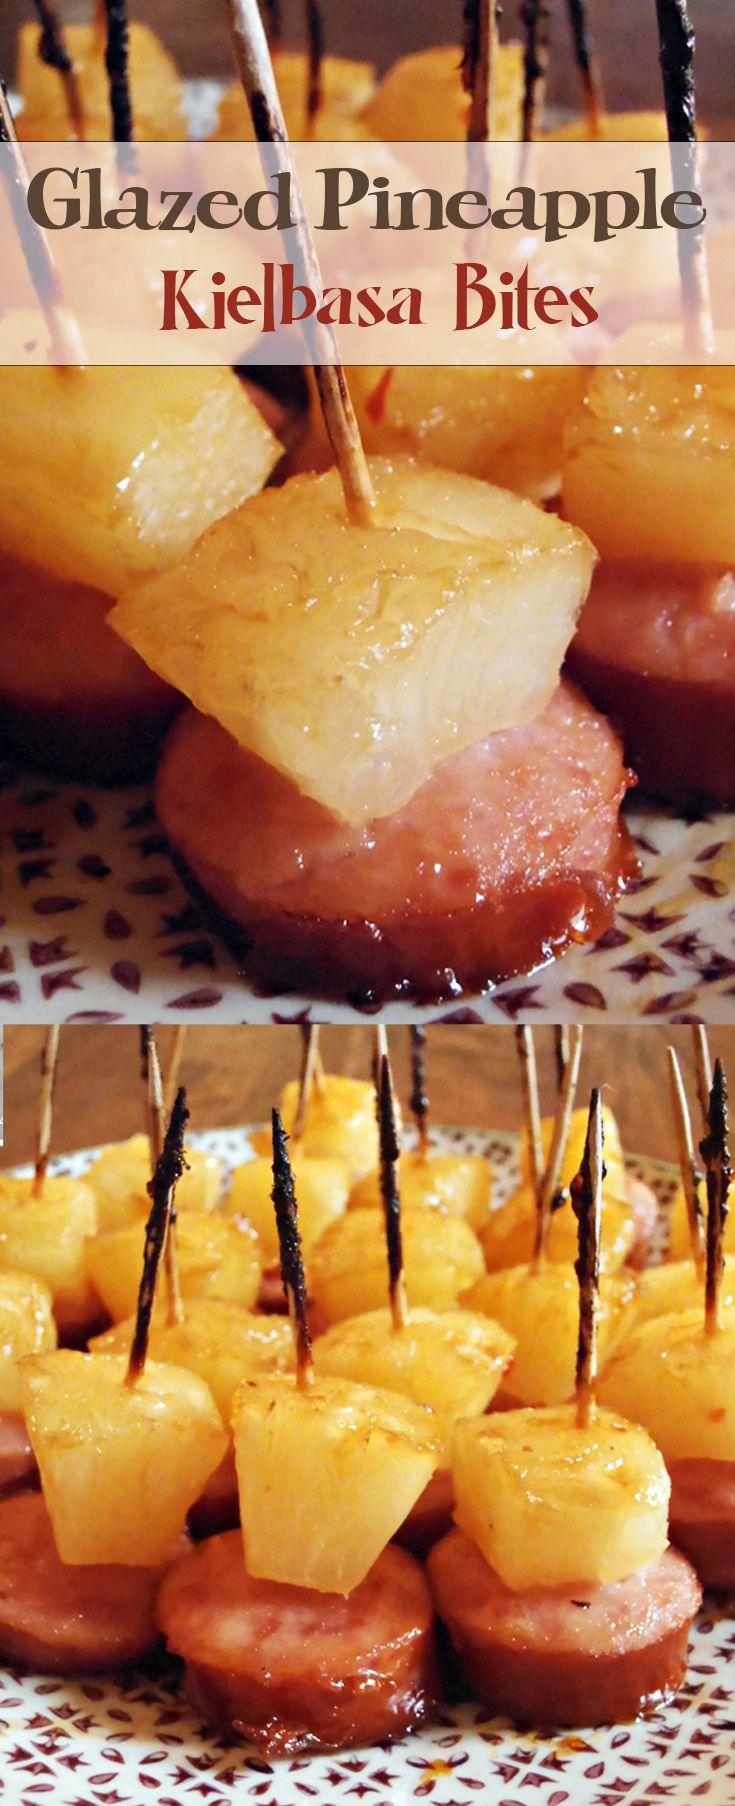 Glazed Pineapple Kielbasa Bites